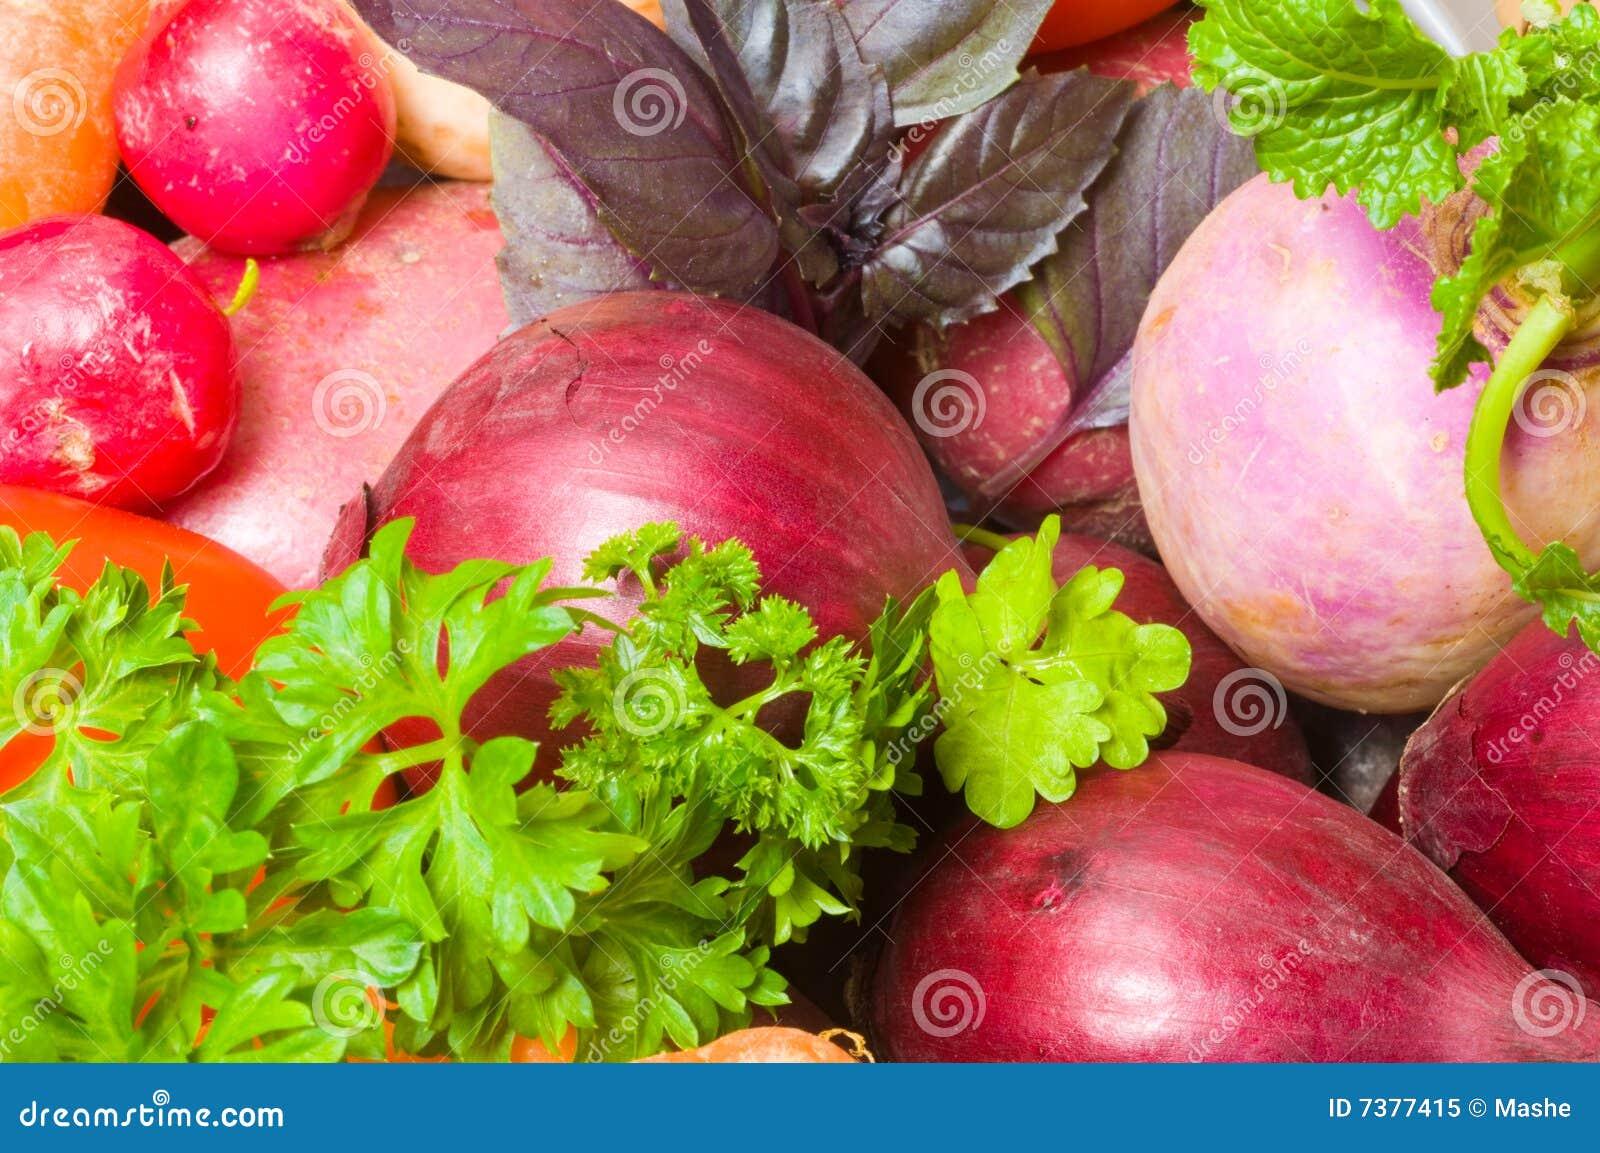 Fresh beautiful vegetables yield royalty free stock photo for Beautiful vegetables